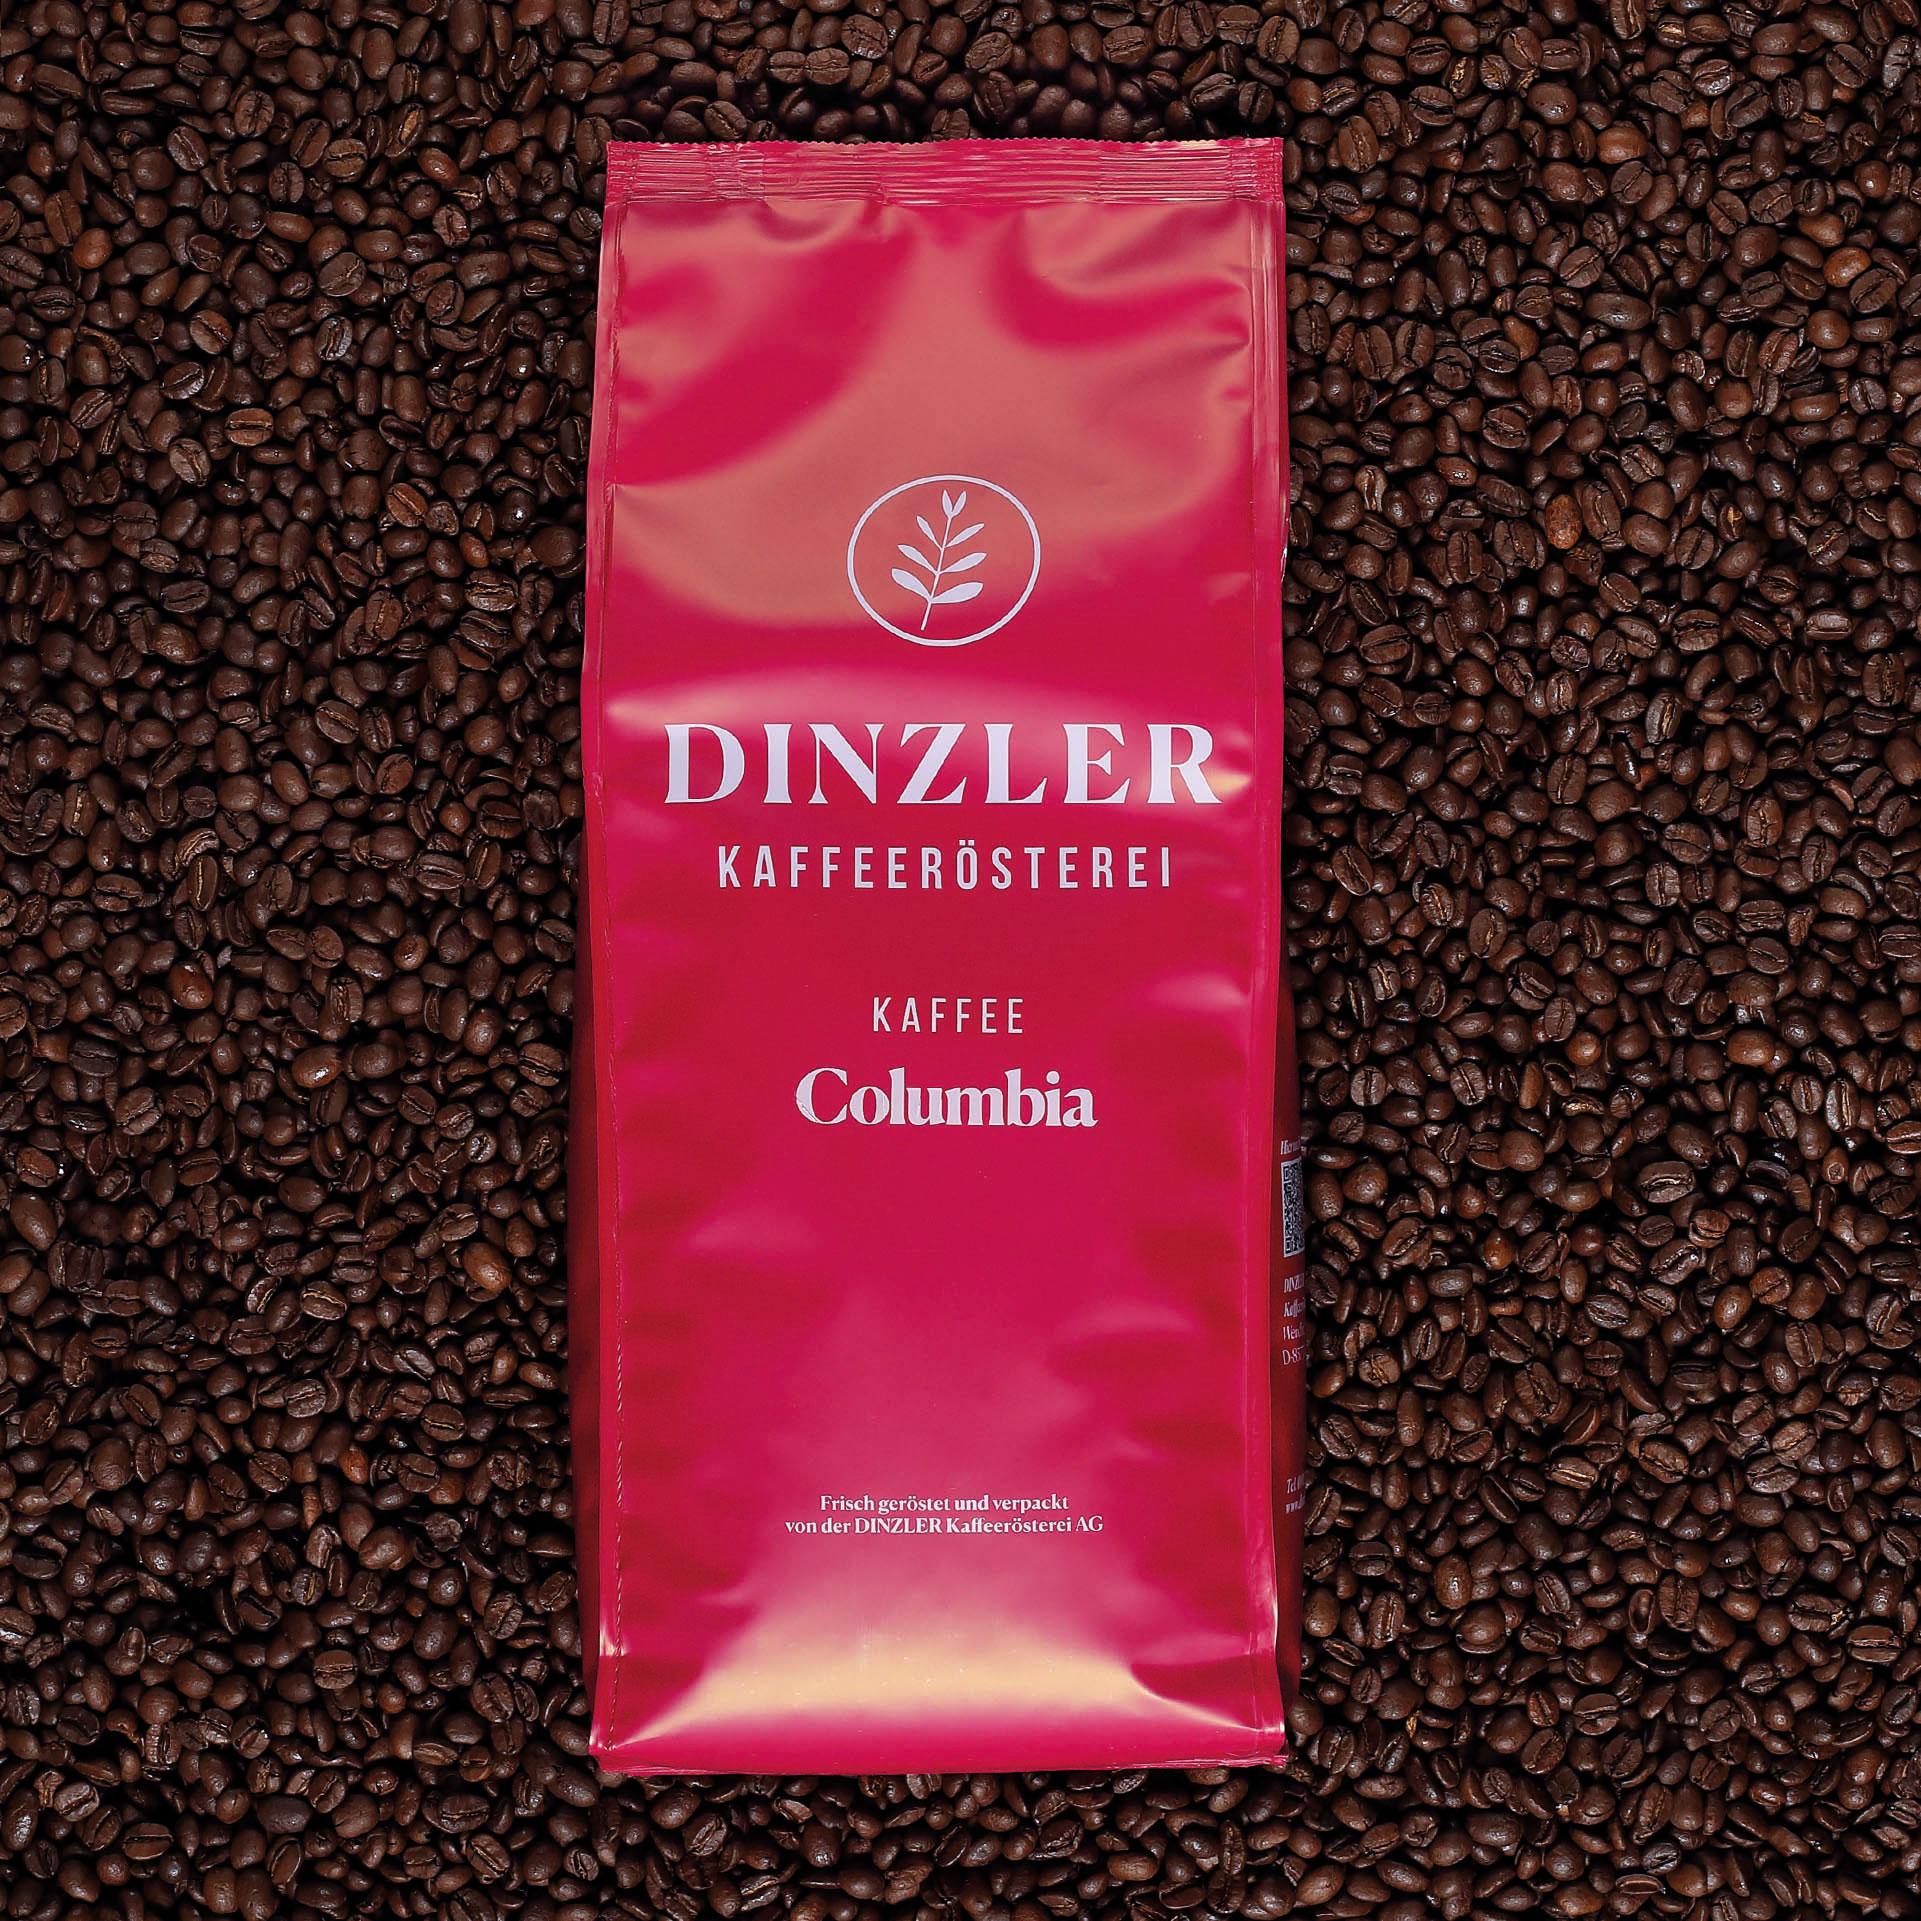 Kaffee Columbia | DINZLER Shop